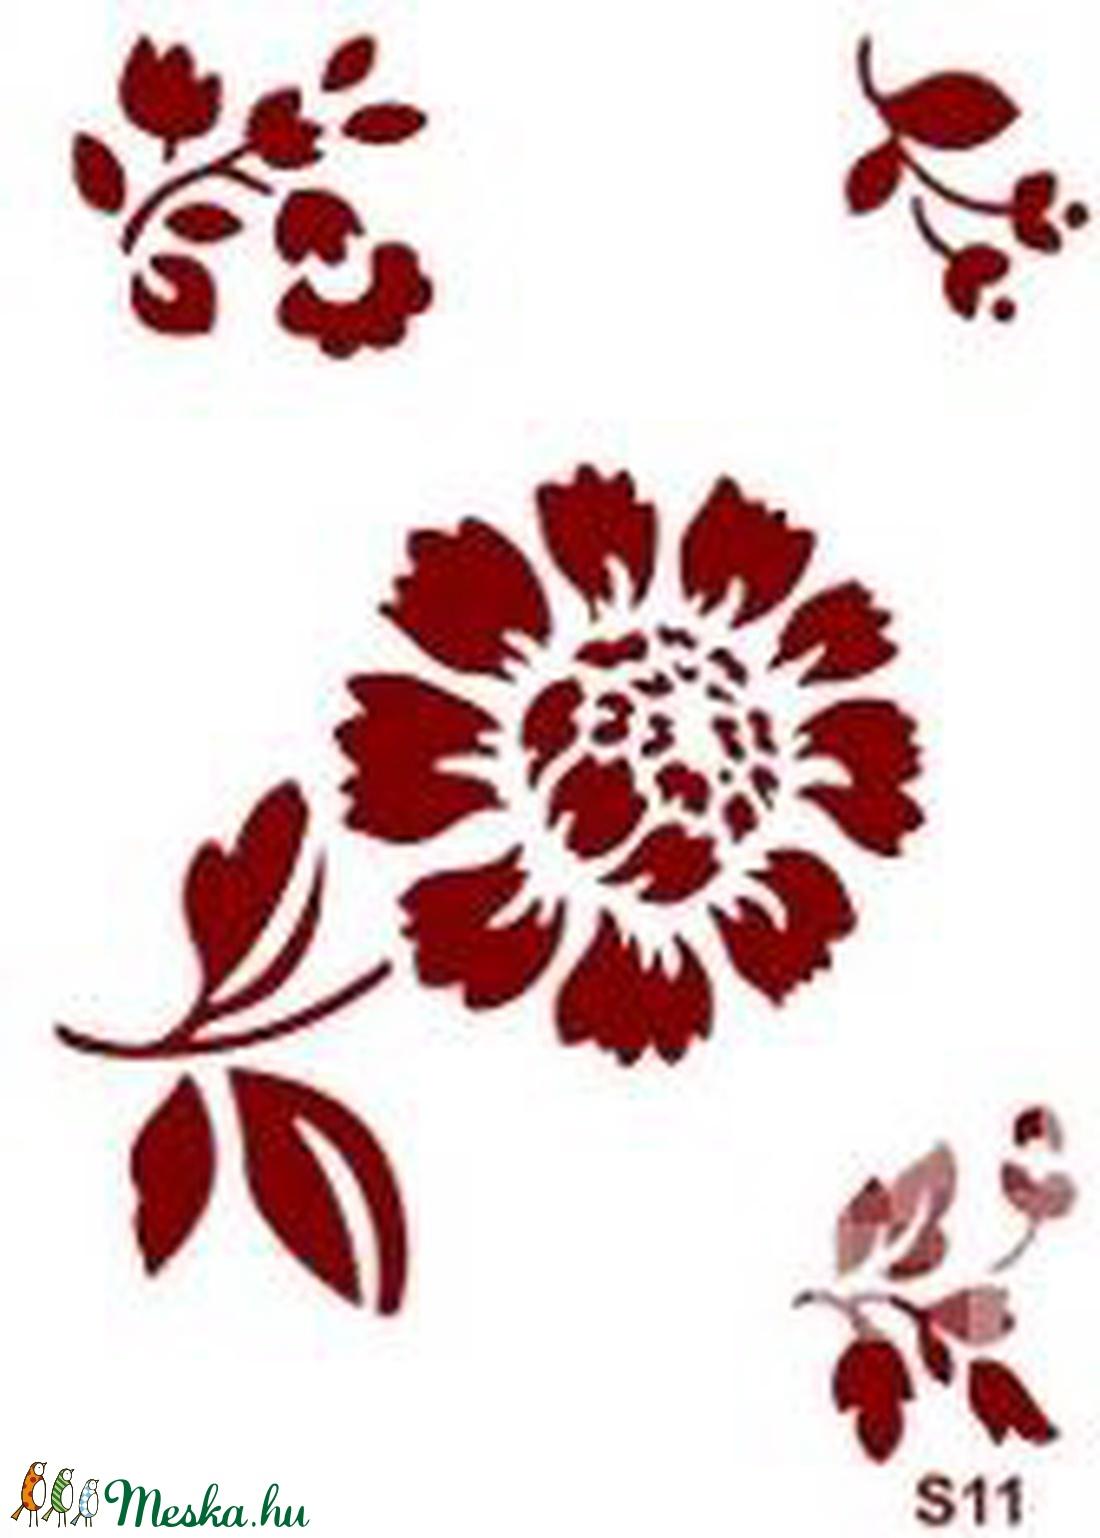 Sablon - S11 (14,5x20 cm/1 db) - virágok (csimbo) - Meska.hu